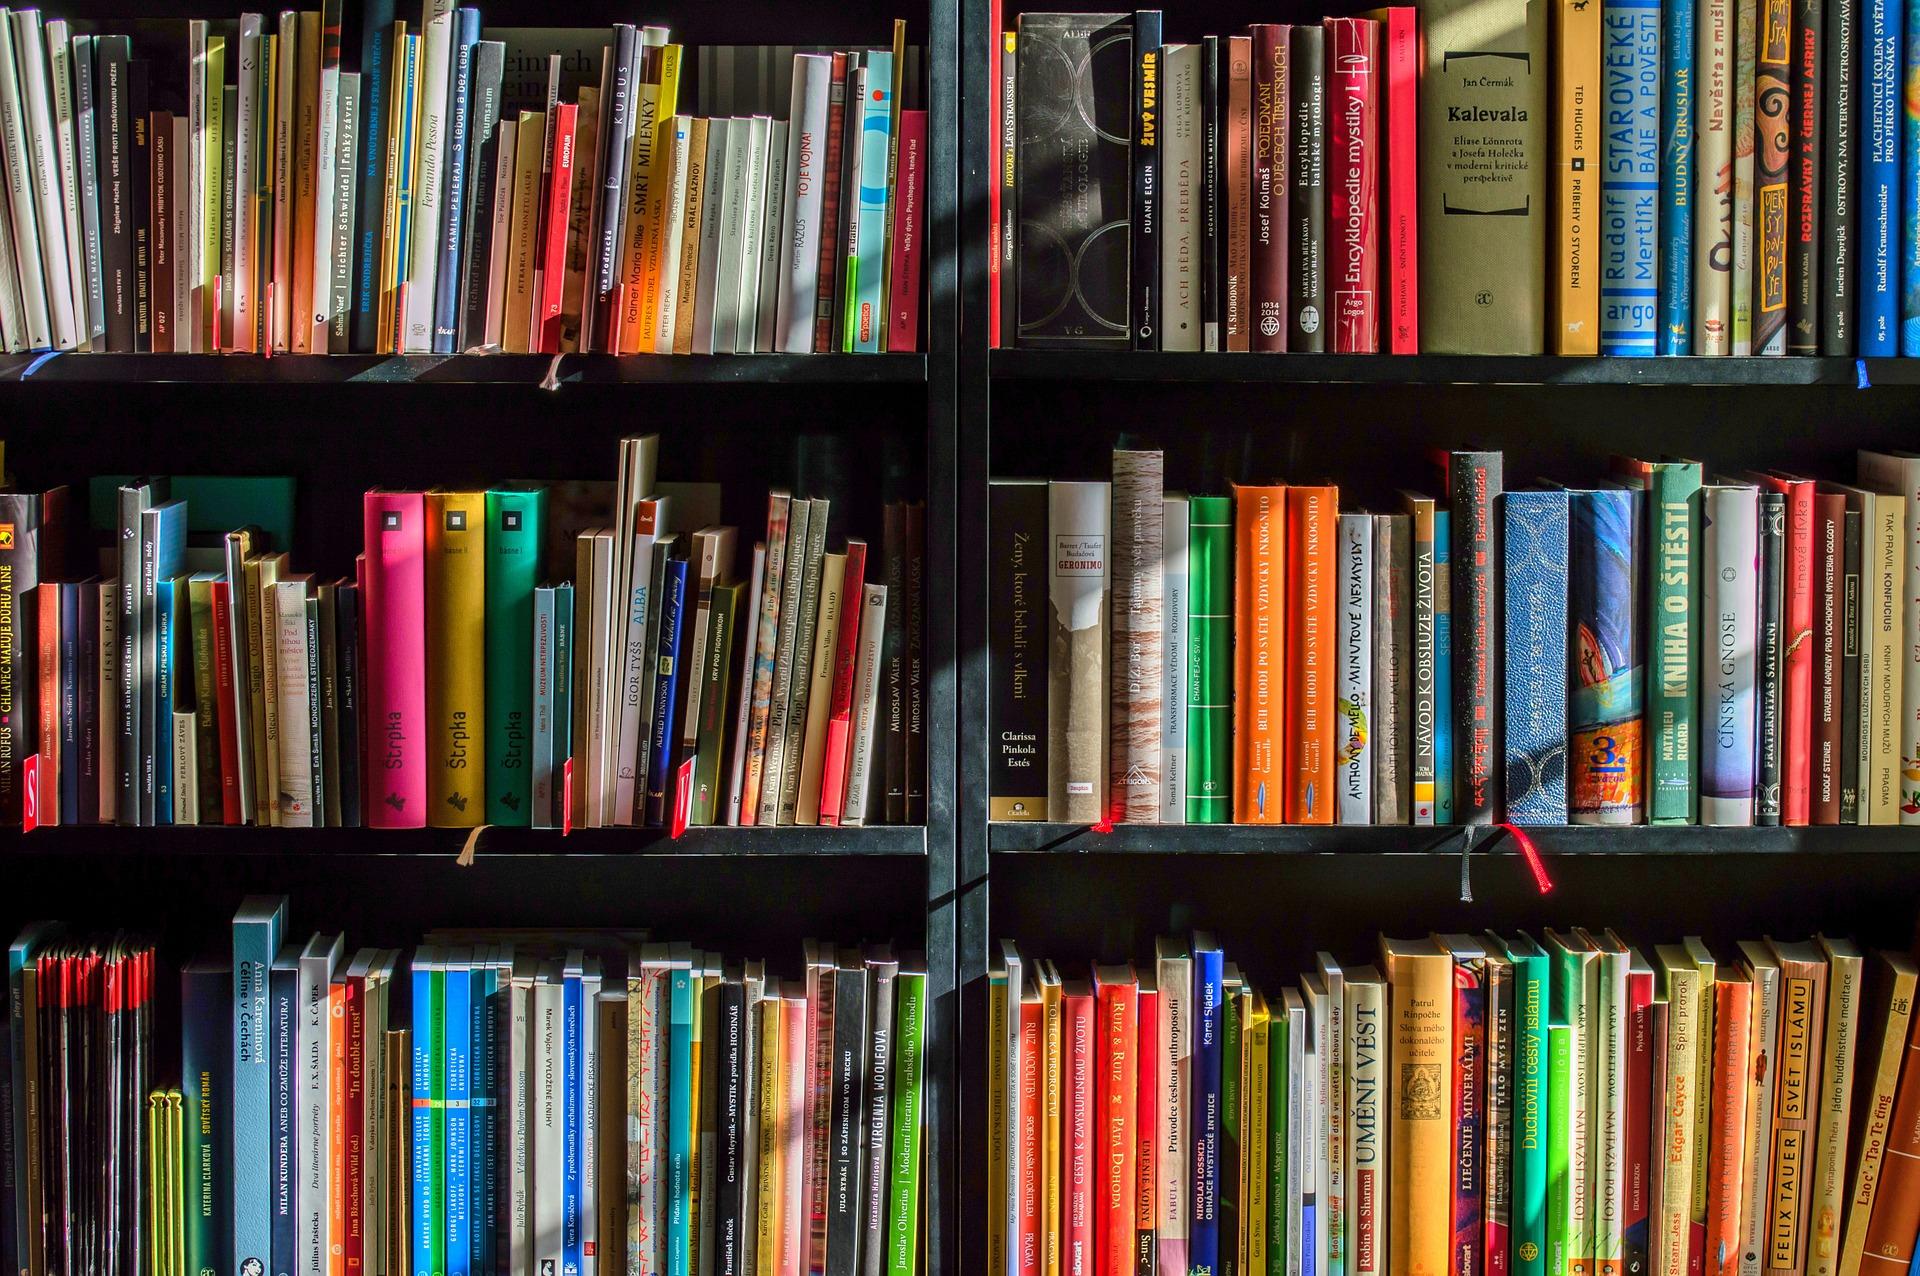 Colourful books on shelves.